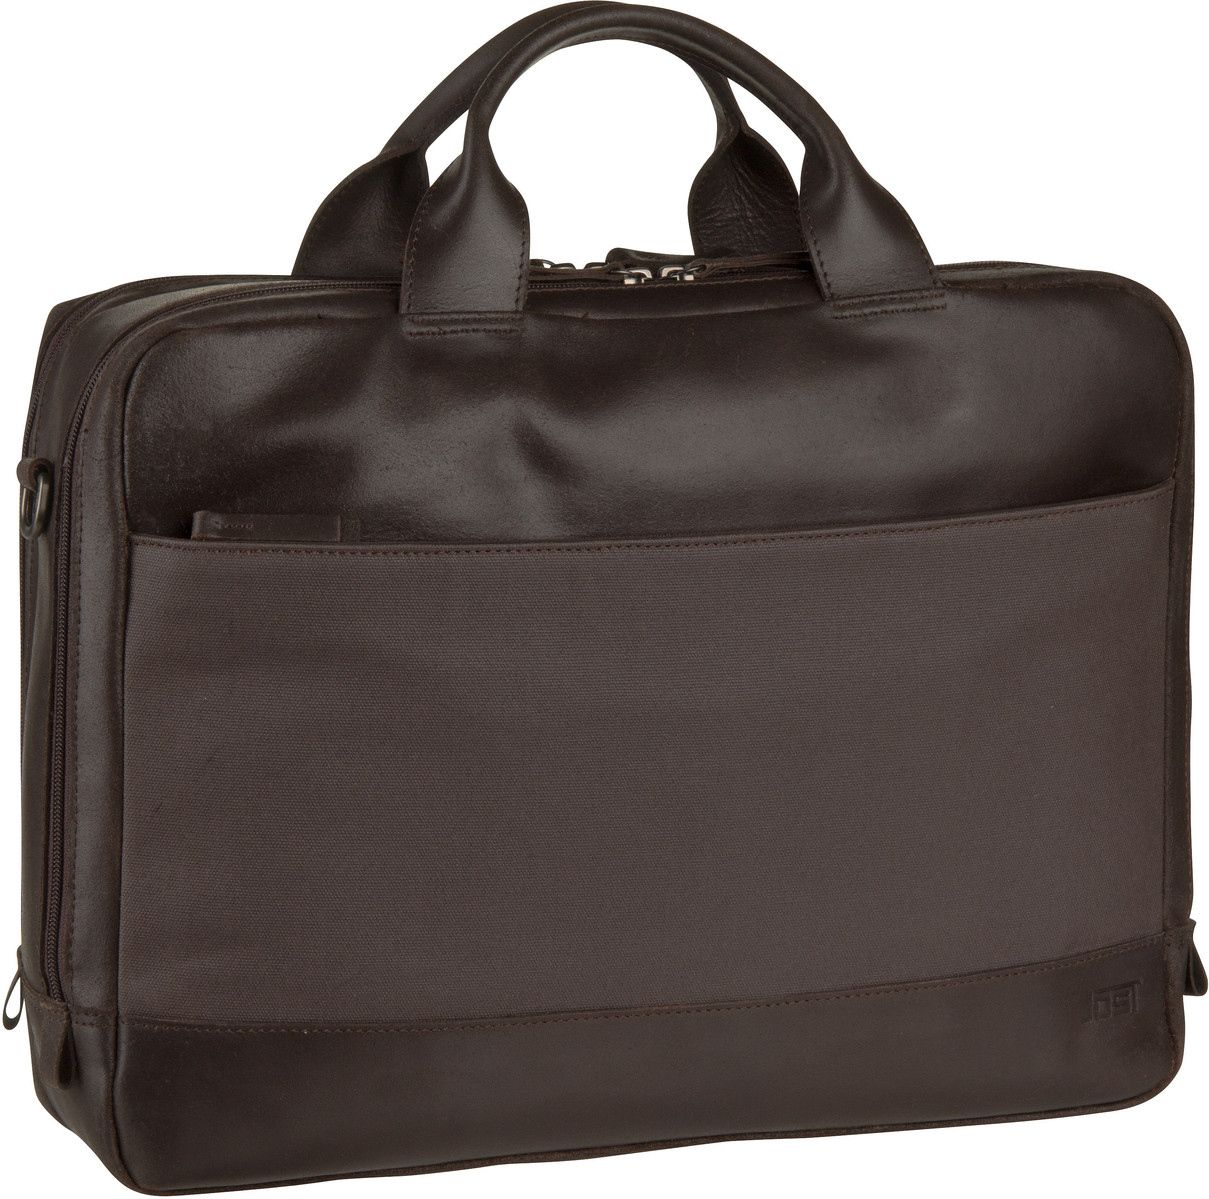 Jost Notebooktasche / Tablet Varberg 7177 Businesstasche L Braun